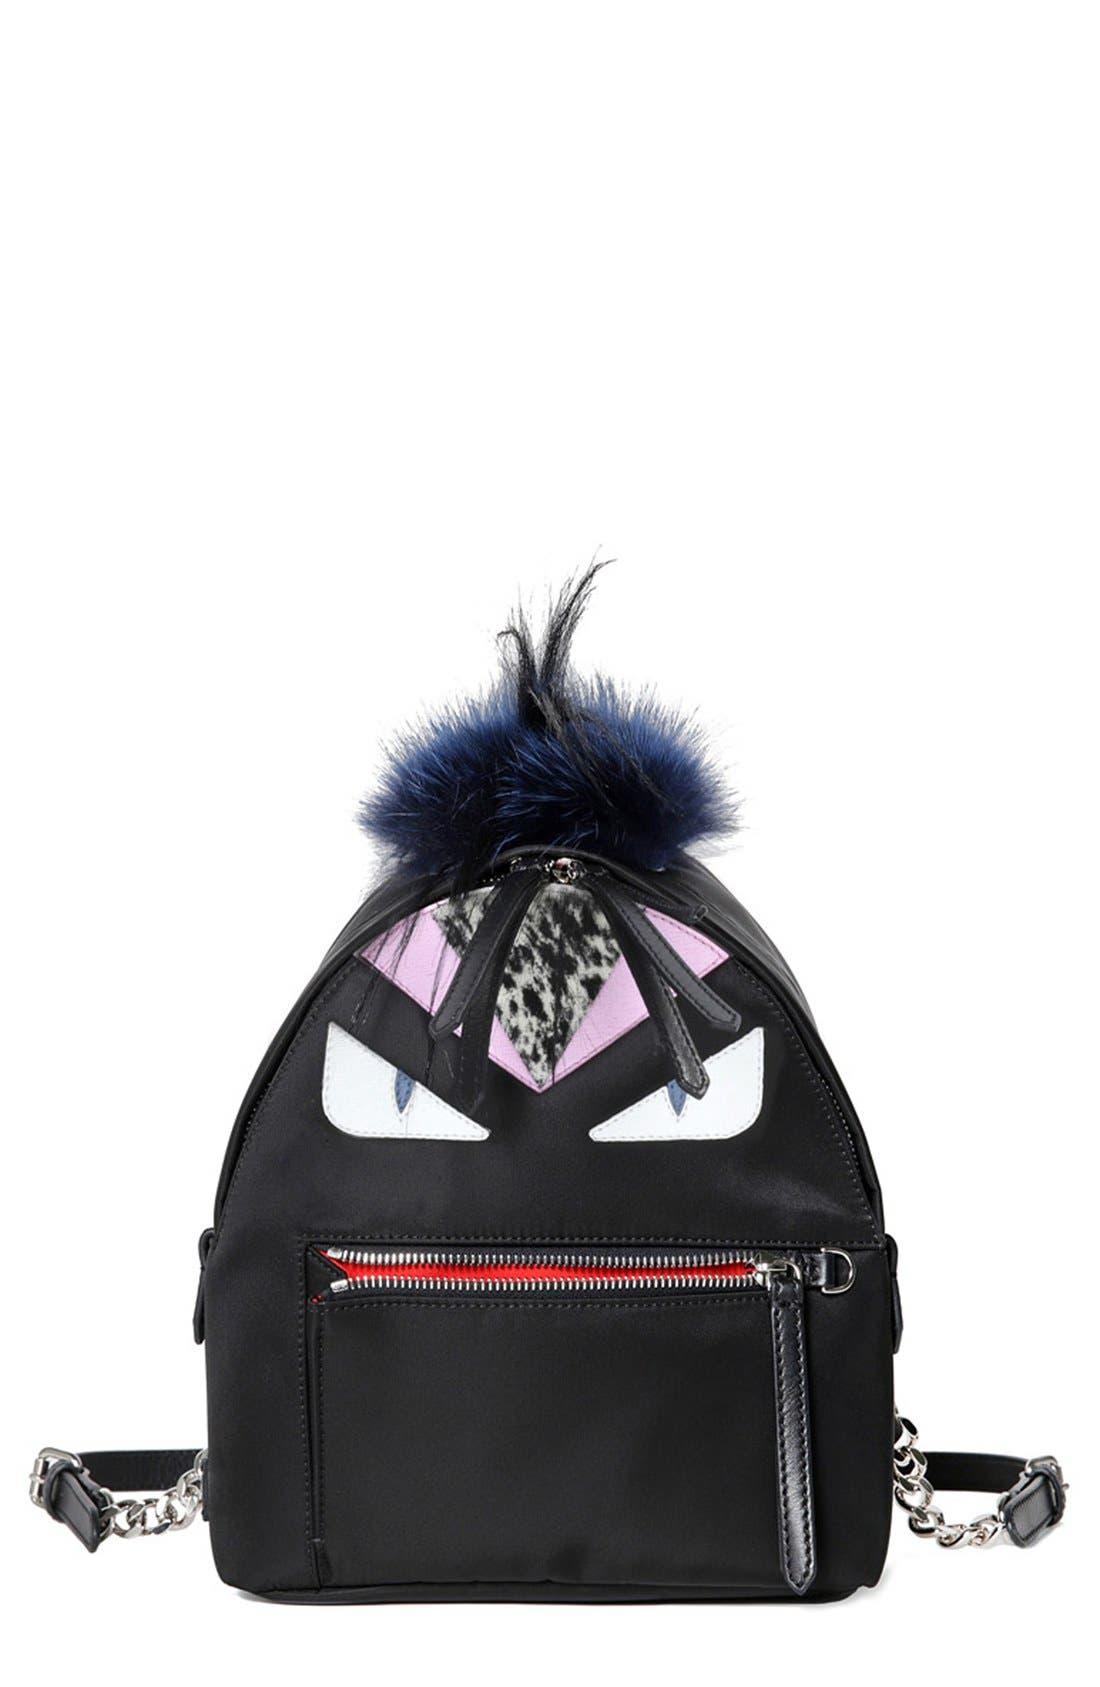 'Mini Monster' Nylon Backpack,                             Main thumbnail 1, color,                             001